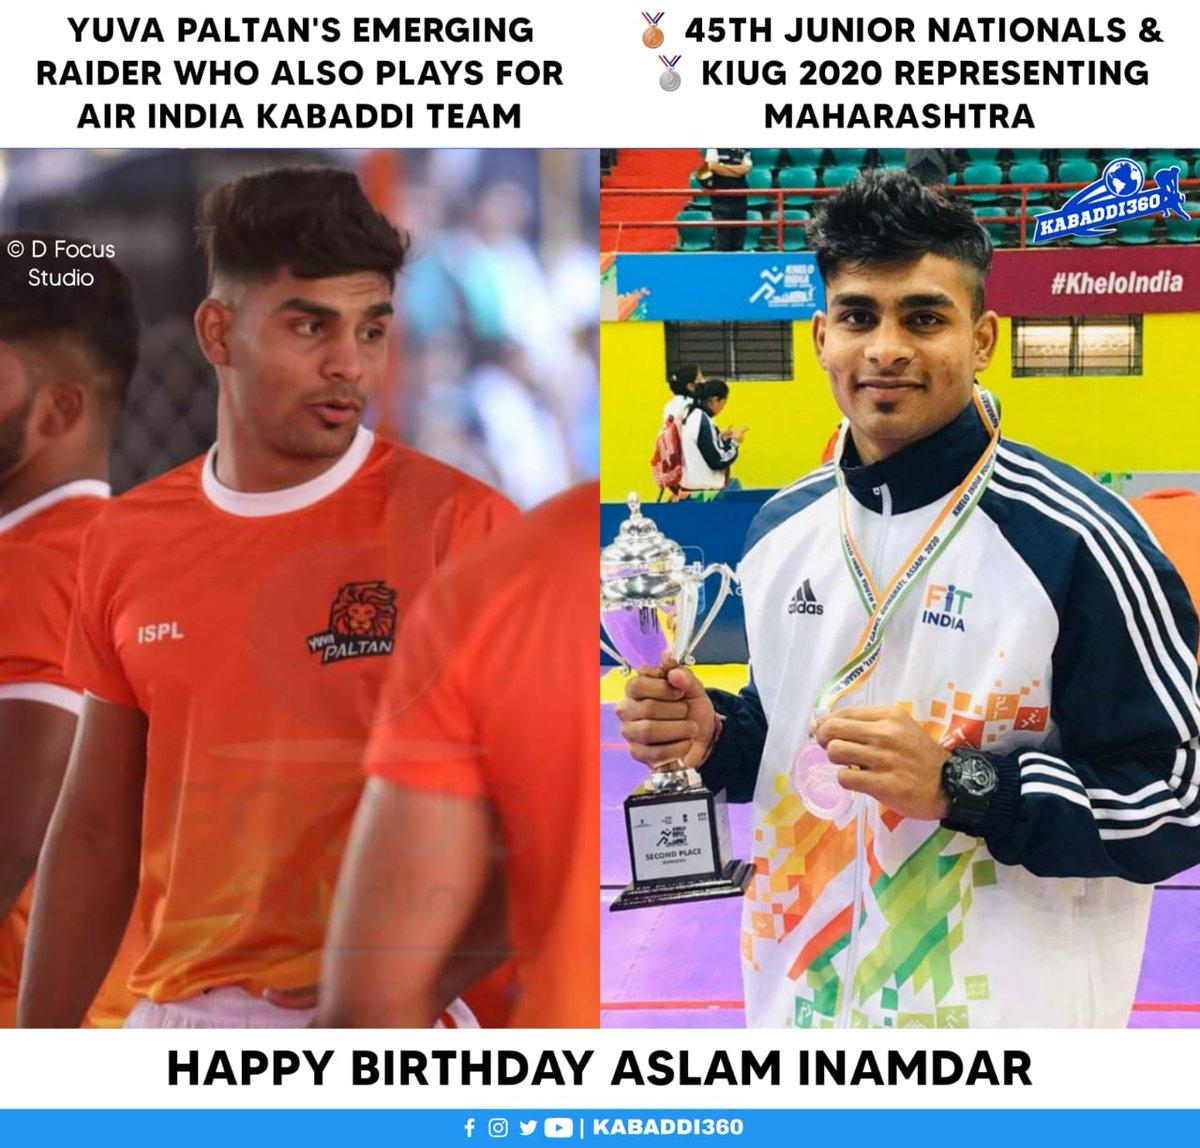 Wishing Maharashtra's young exciting talented raider Aslam Inamdar a very happy birthday 🎂  #AslamInamdar #MaharashtraKabaddi #HappyBirthday #Kabaddi360